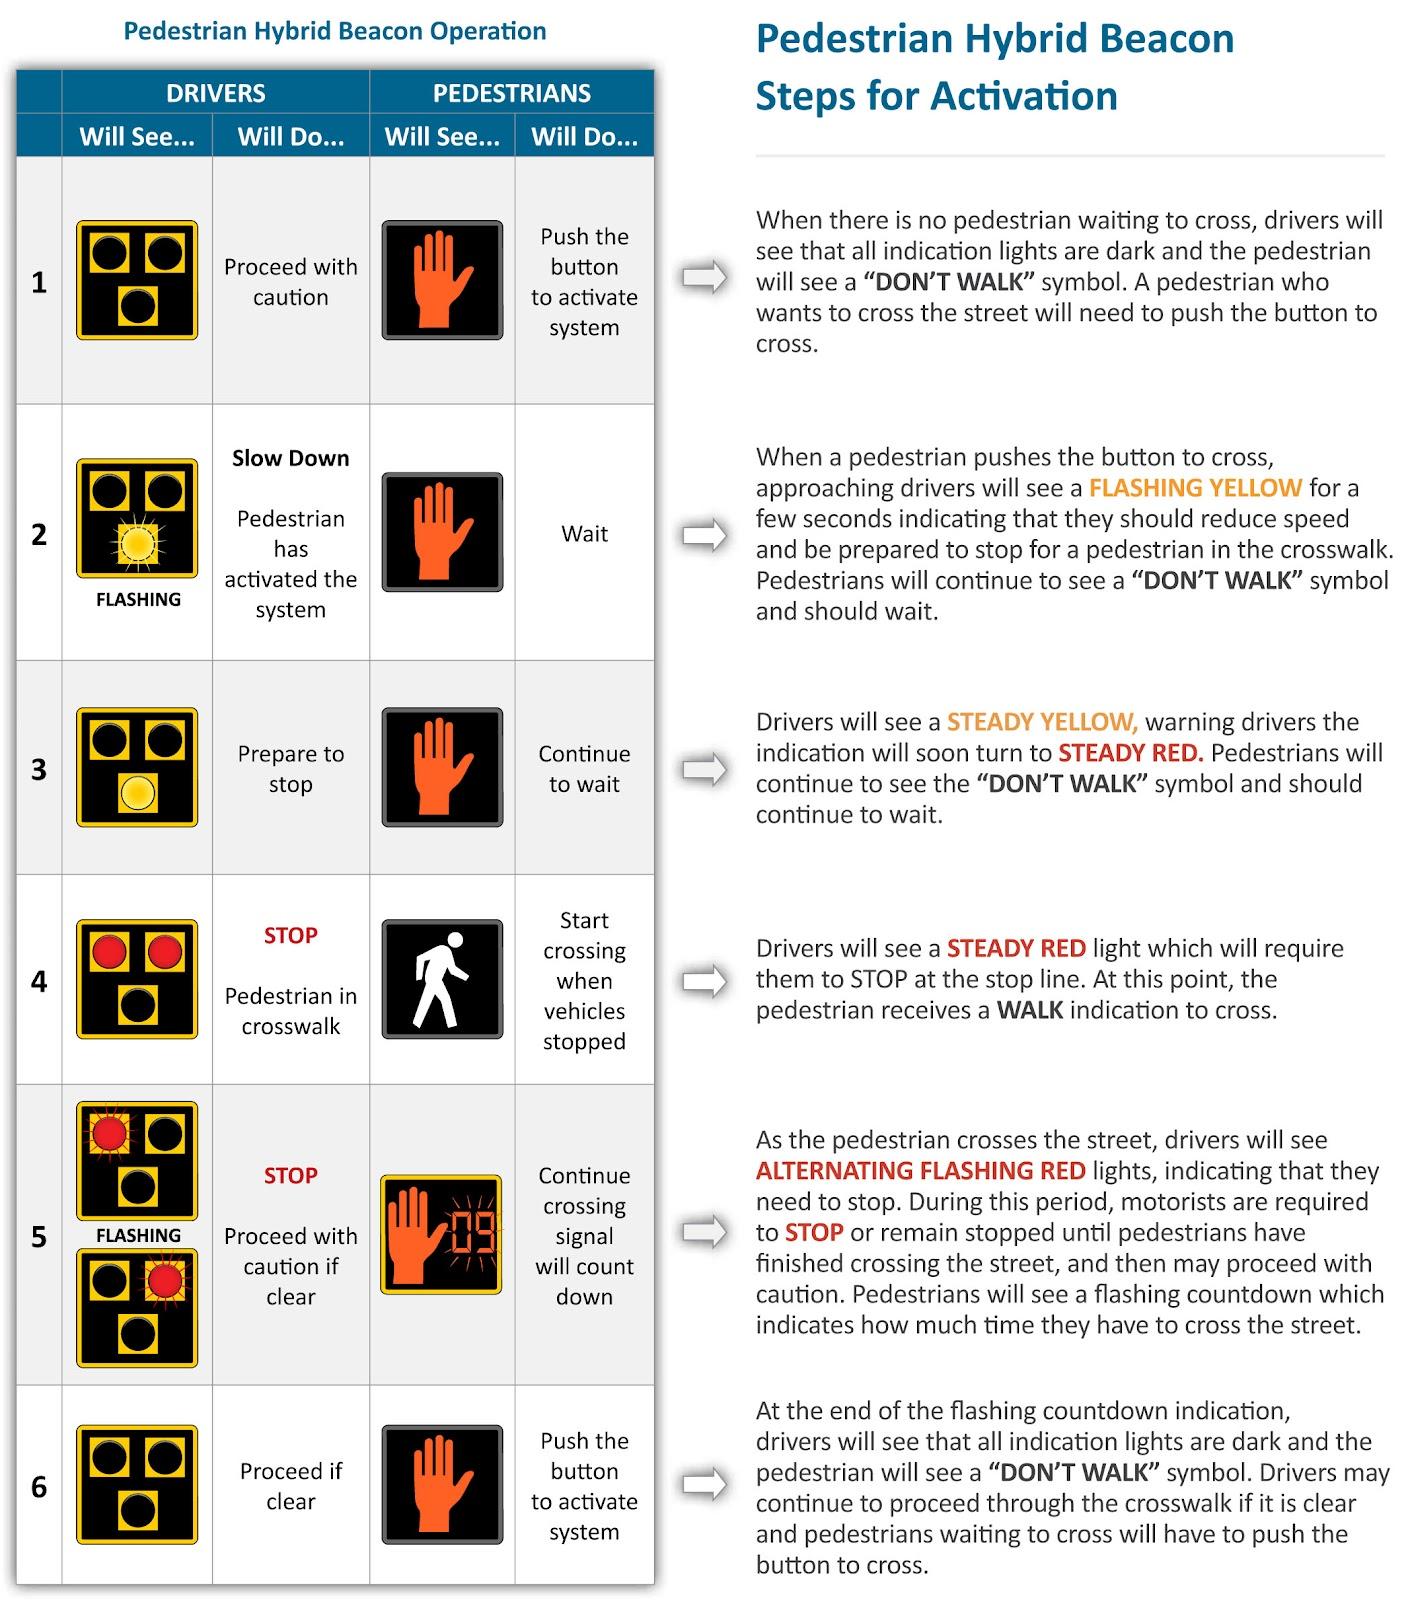 Pedestrian Hybrid Beacon Instructions